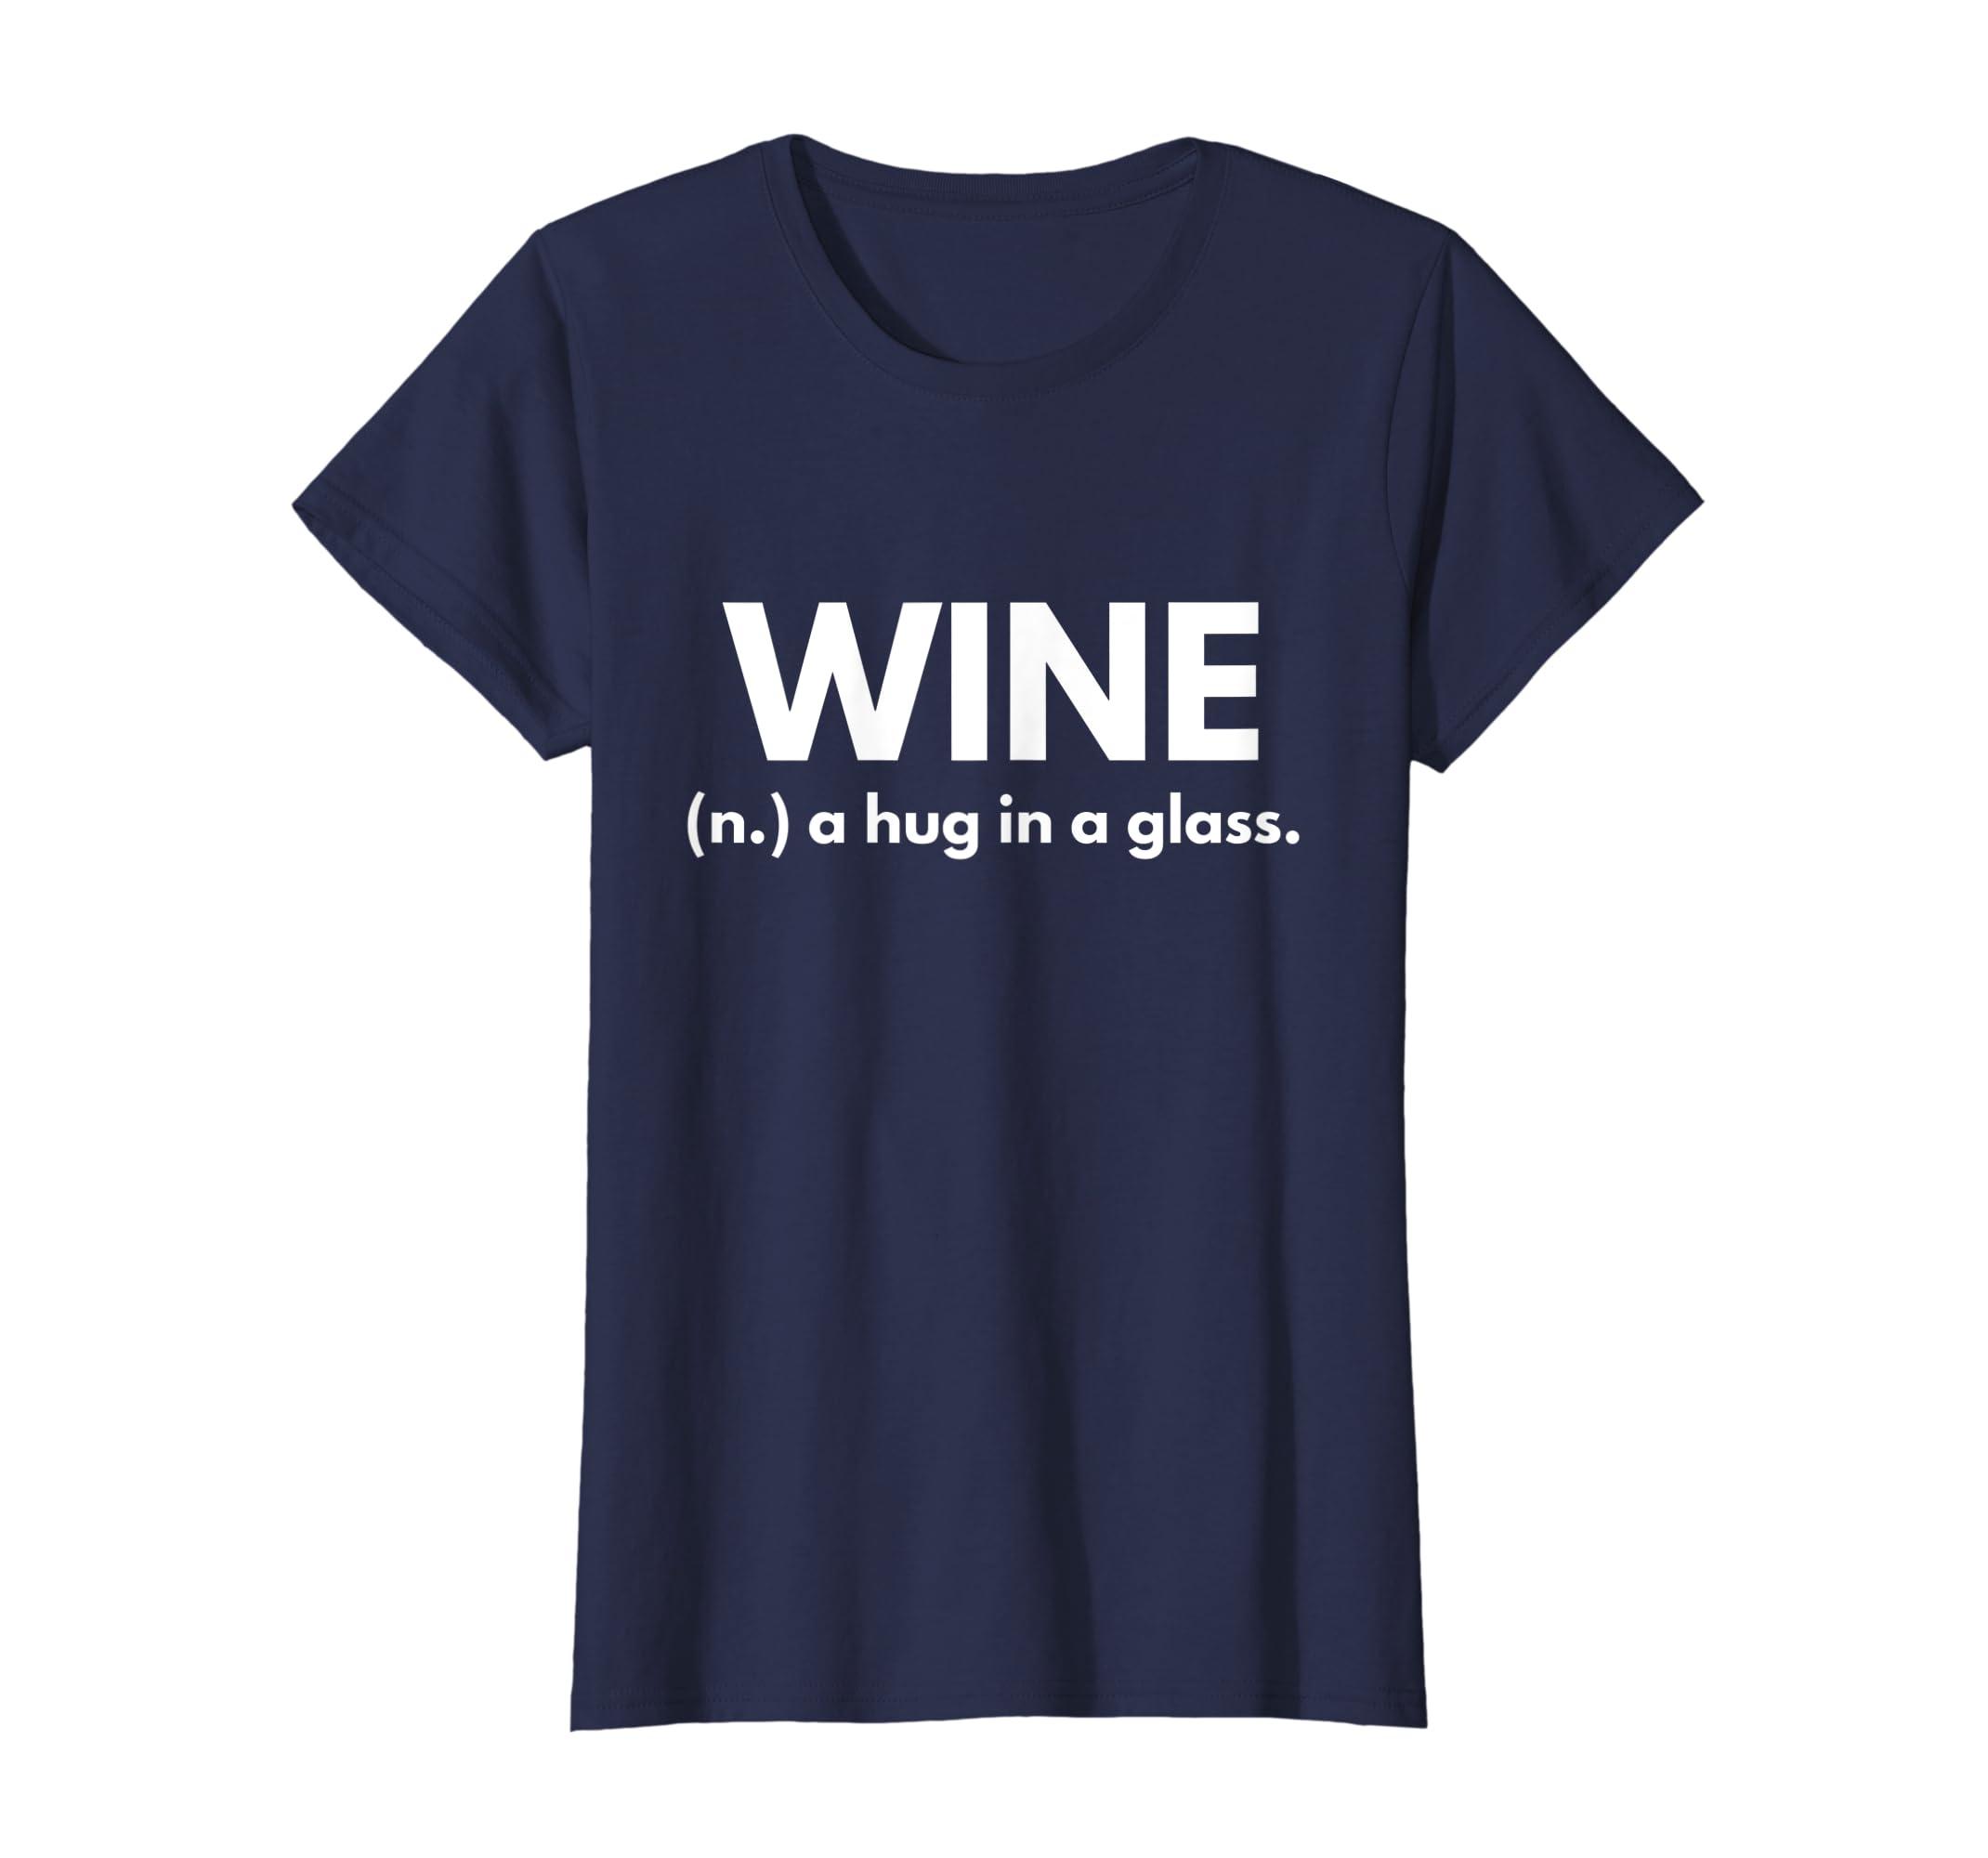 3d80a848 Amazon.com: Wine (n.) A Hug In A Glass t-shirt: Clothing